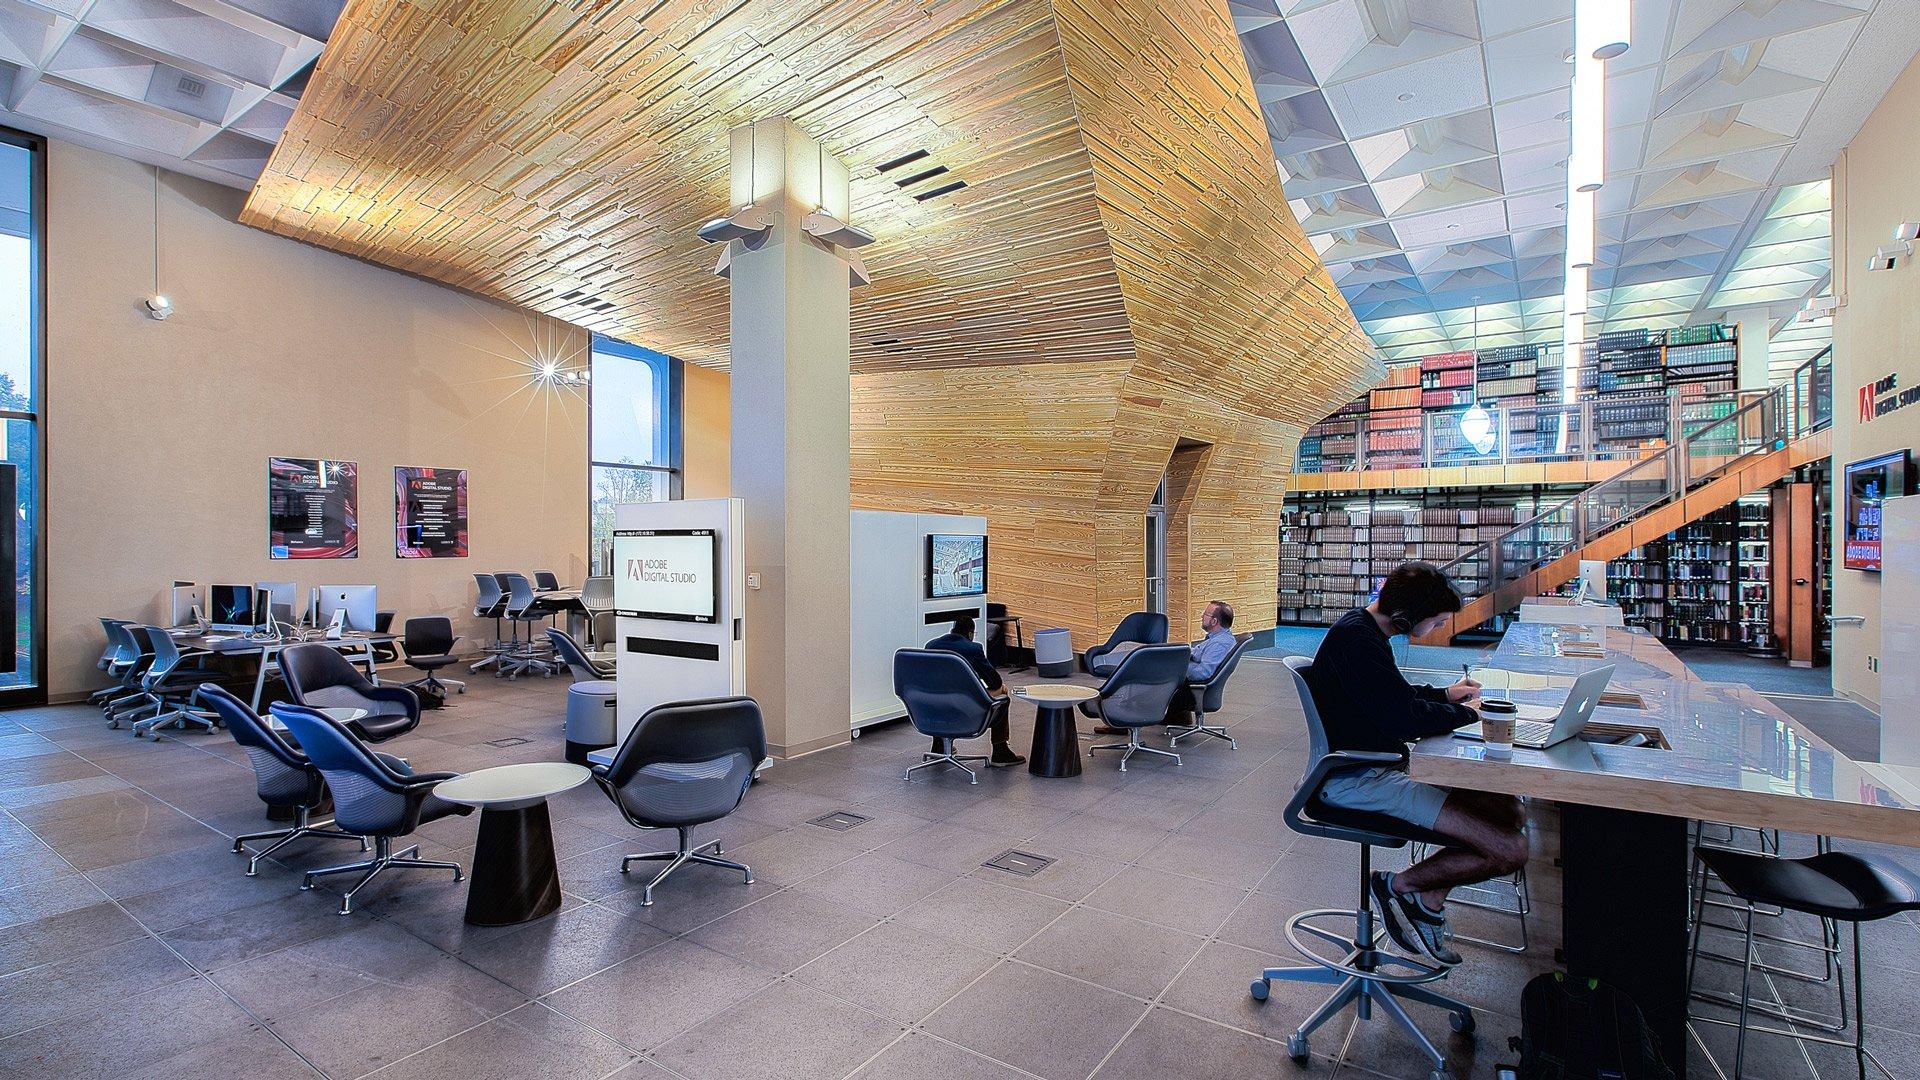 Clemson University, RM Cooper Library, Adobe Digital Studio